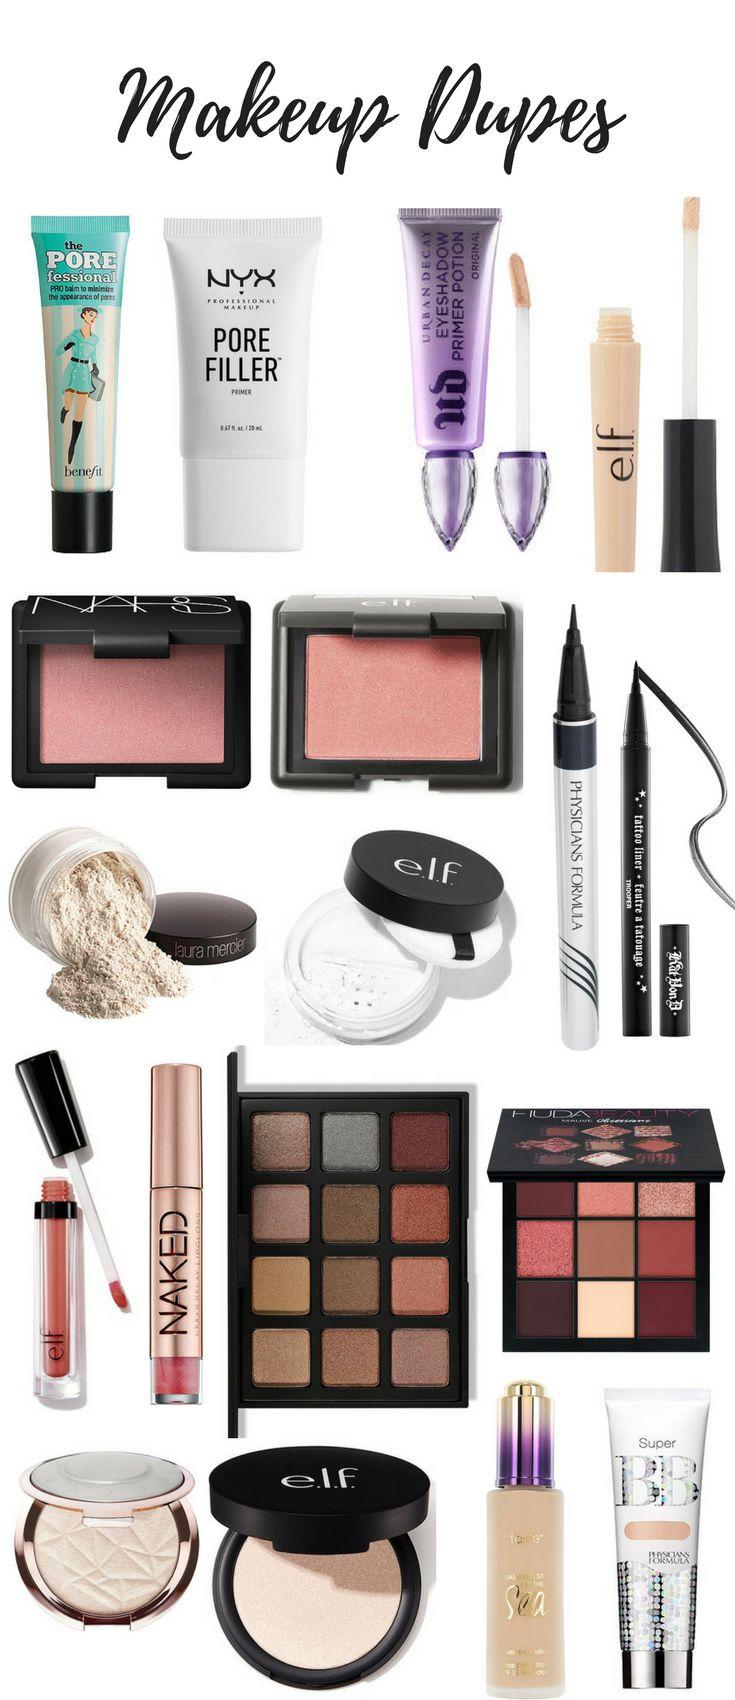 Dupes For Kylie Jenner Lipstick: Best 25+ Foundation Dupes Ideas On Pinterest